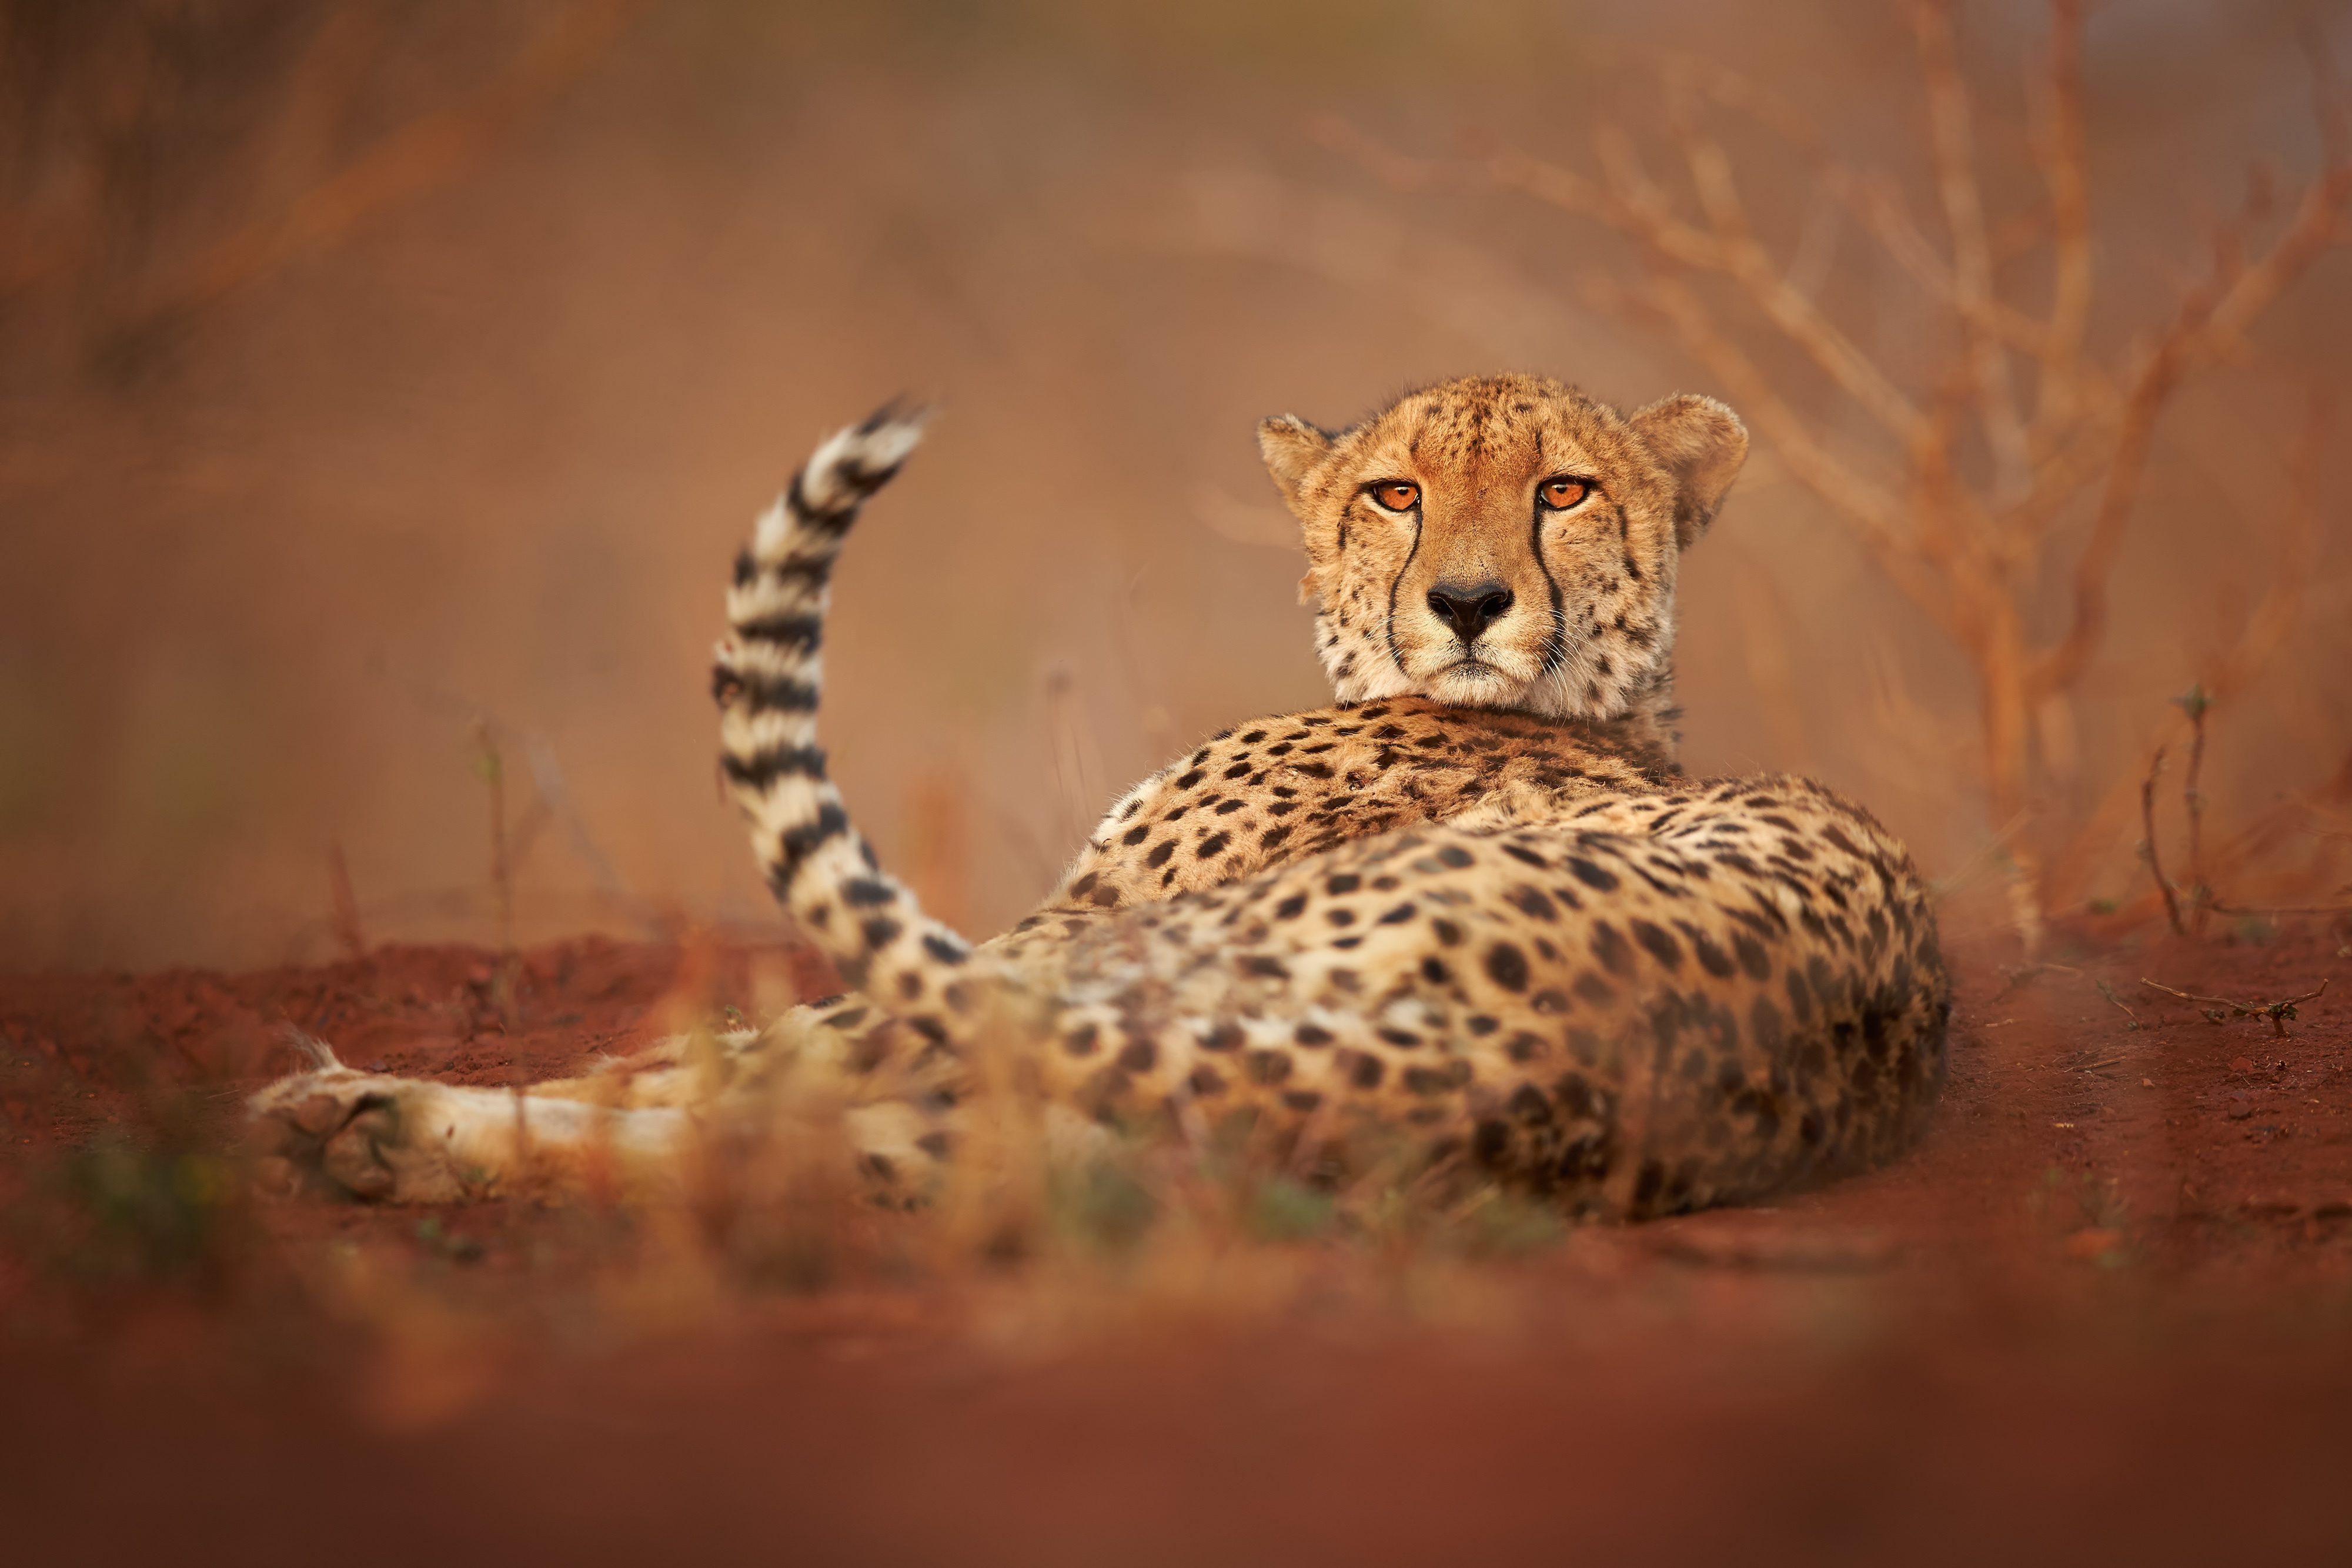 Wild Cheetah, Acinonyx jubatus, relaxing on reddish soil, staring directly at camera. Ground level photography. Typical KwaZulu Natal's dry forest environment. Zimanga, South Africa.